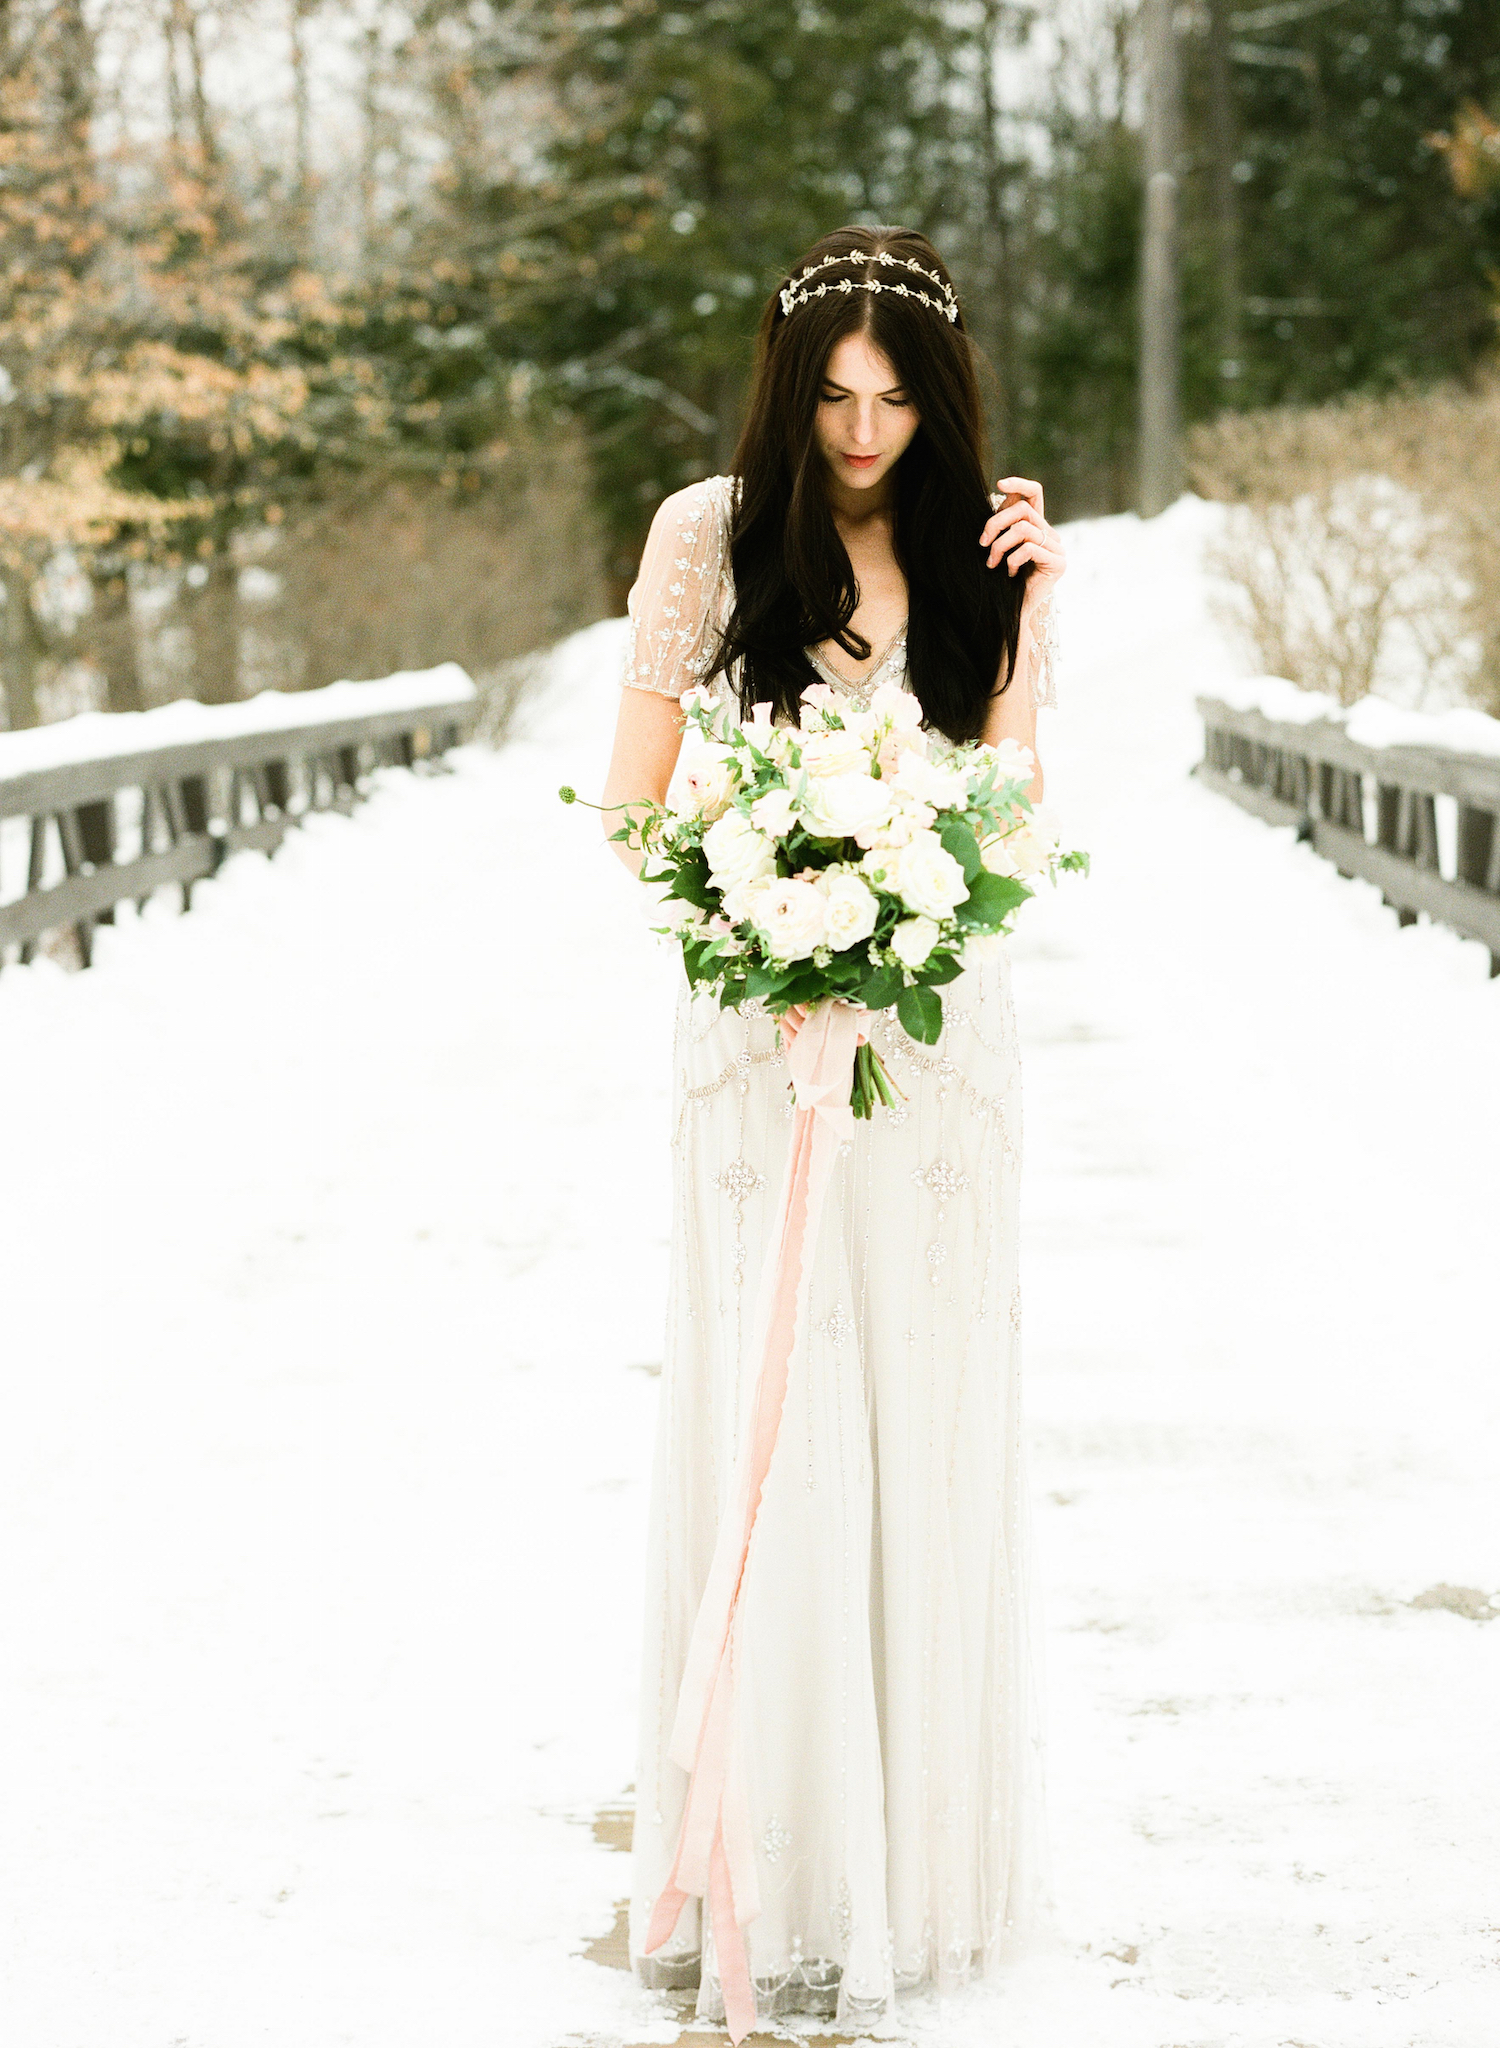 Winter Editorial-JennyPackham-LindsayMaddenPhotography-22 copy.jpg